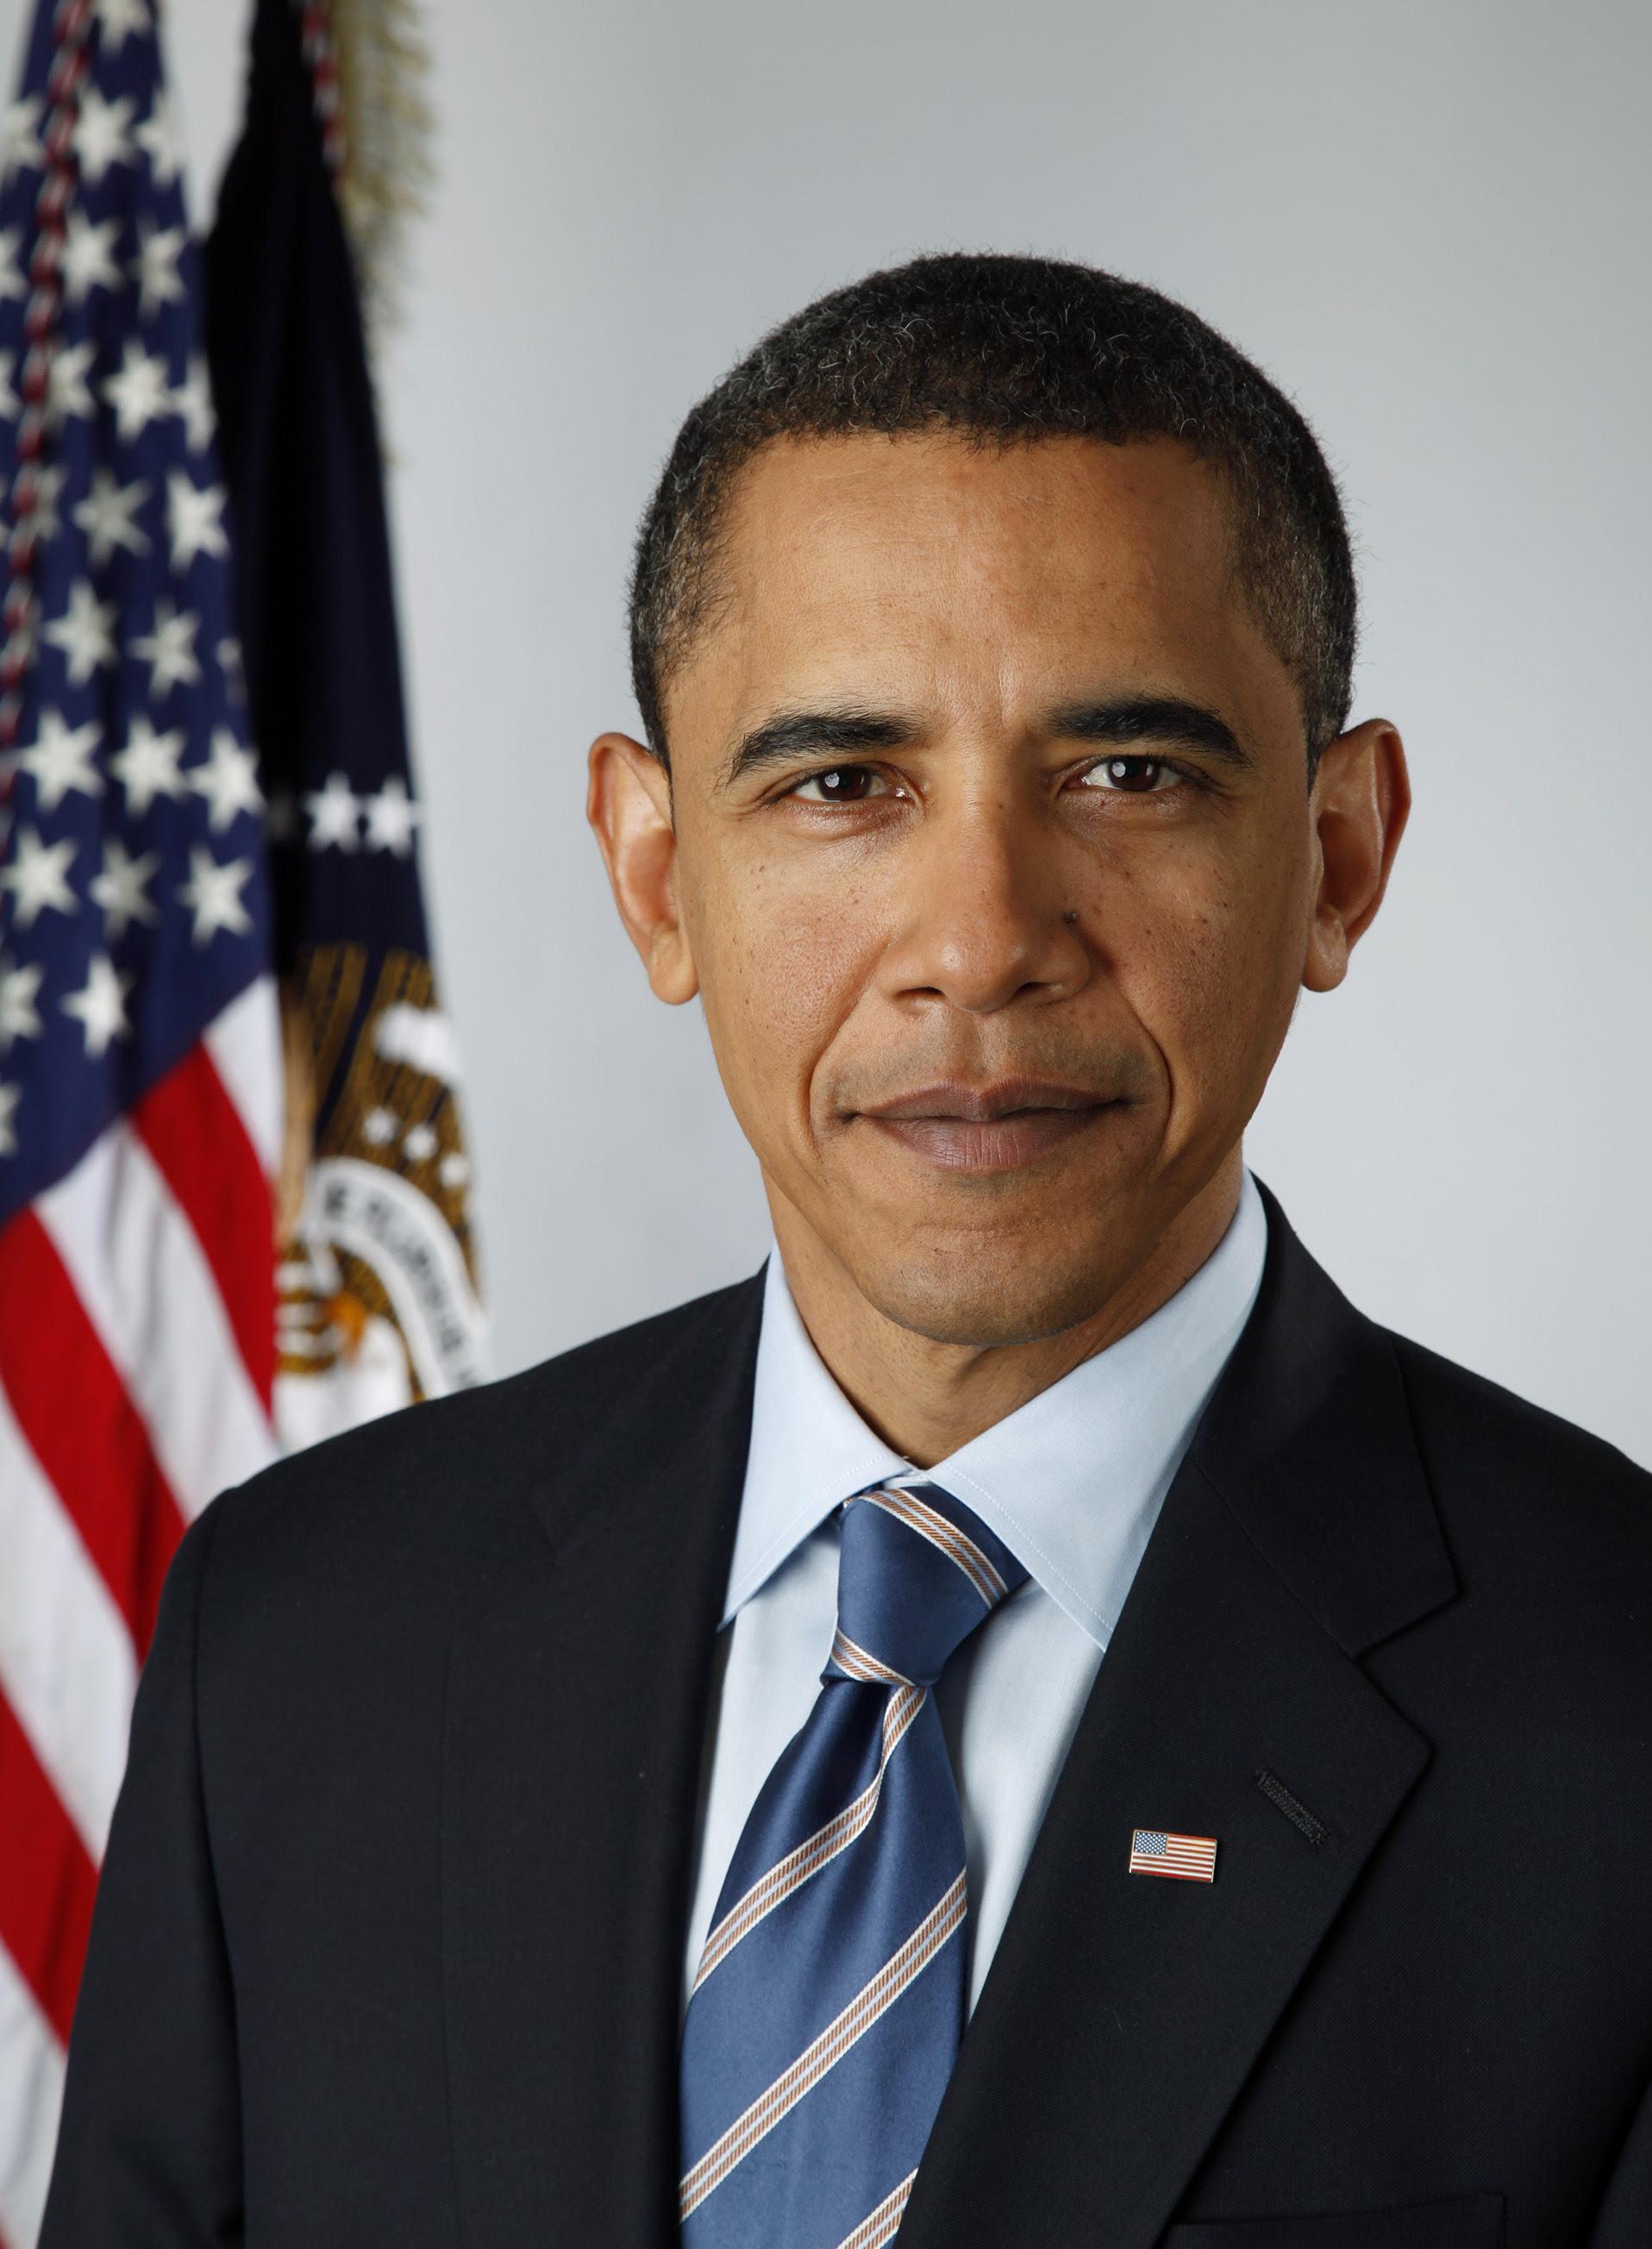 http://upload.wikimedia.org/wikipedia/commons/e/e9/Official_portrait_of_Barack_Obama.jpg